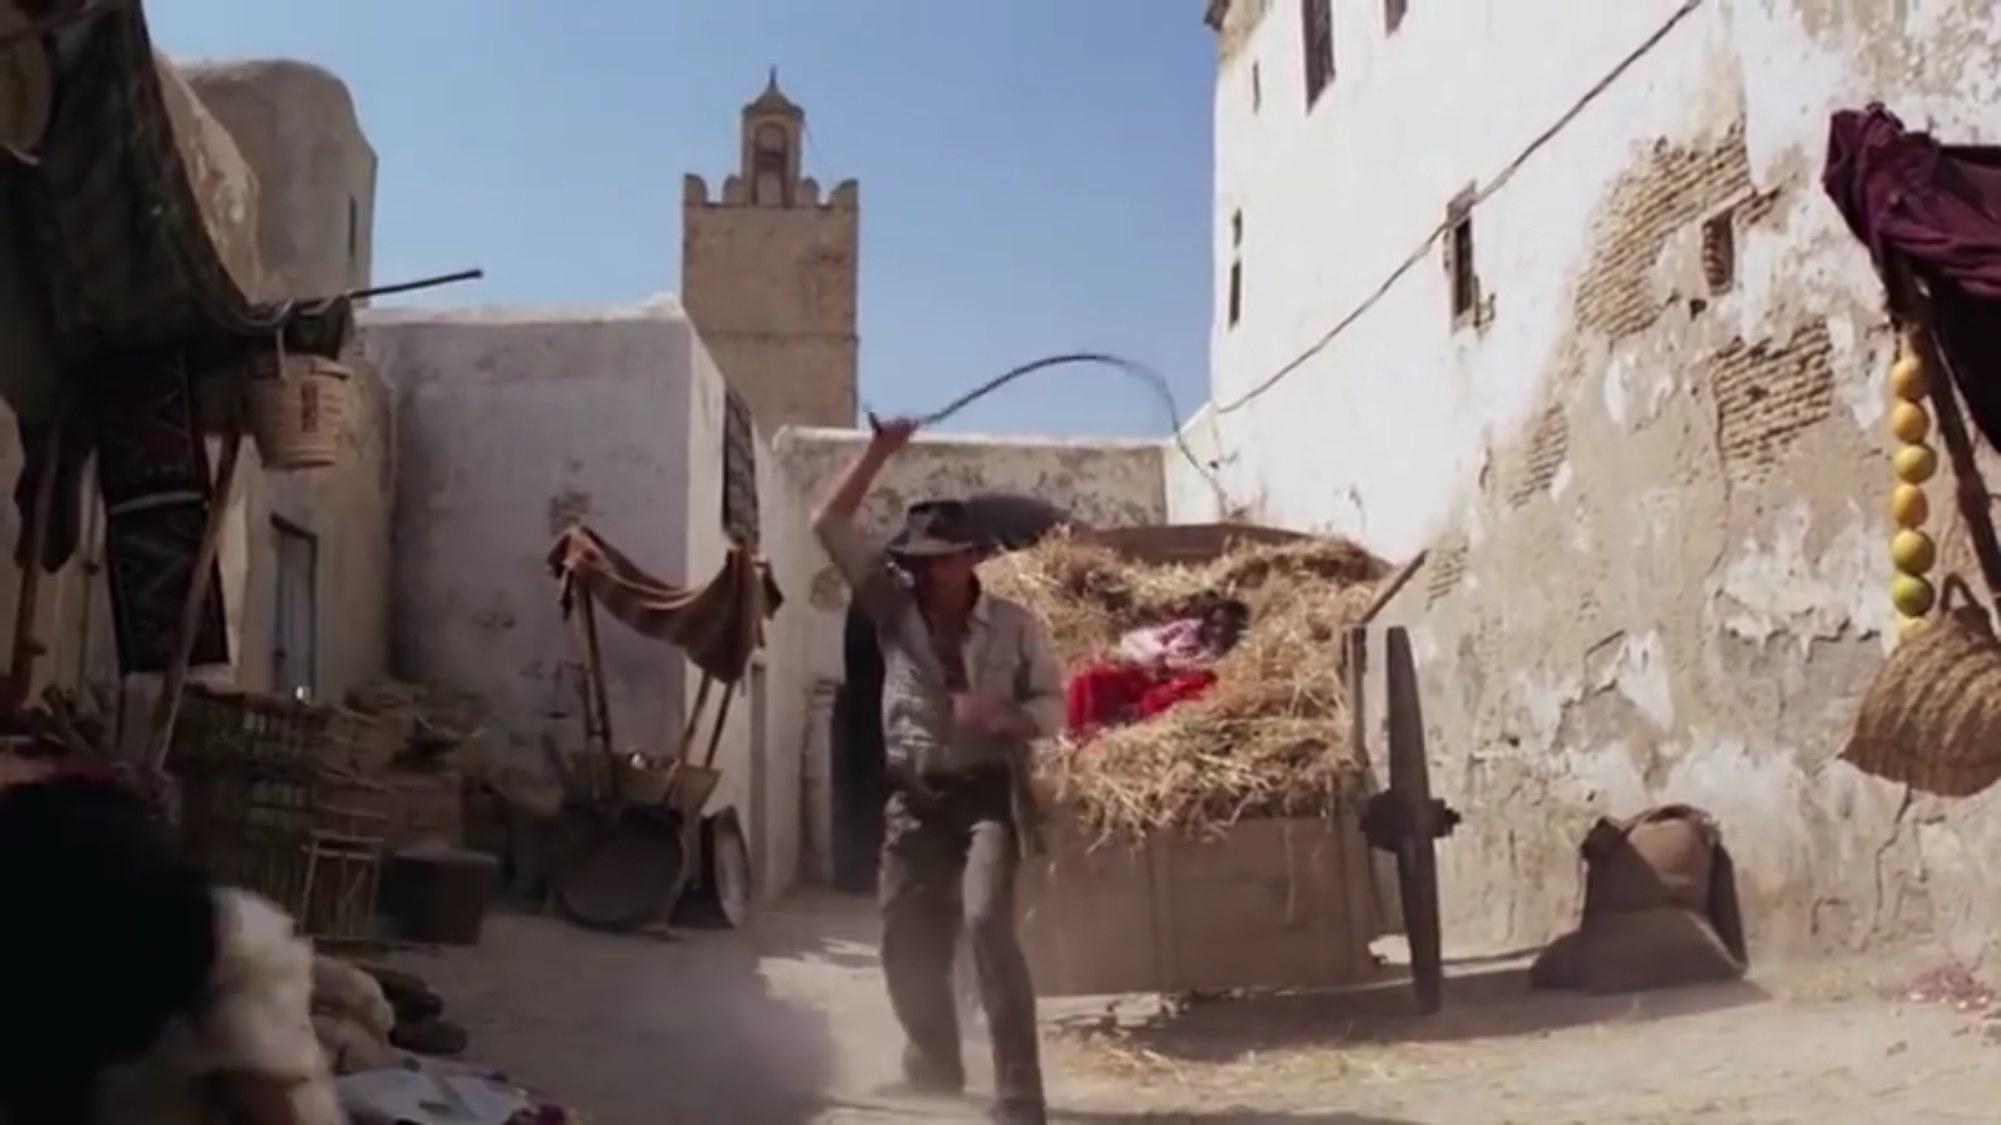 Indiana Jones using his whip.